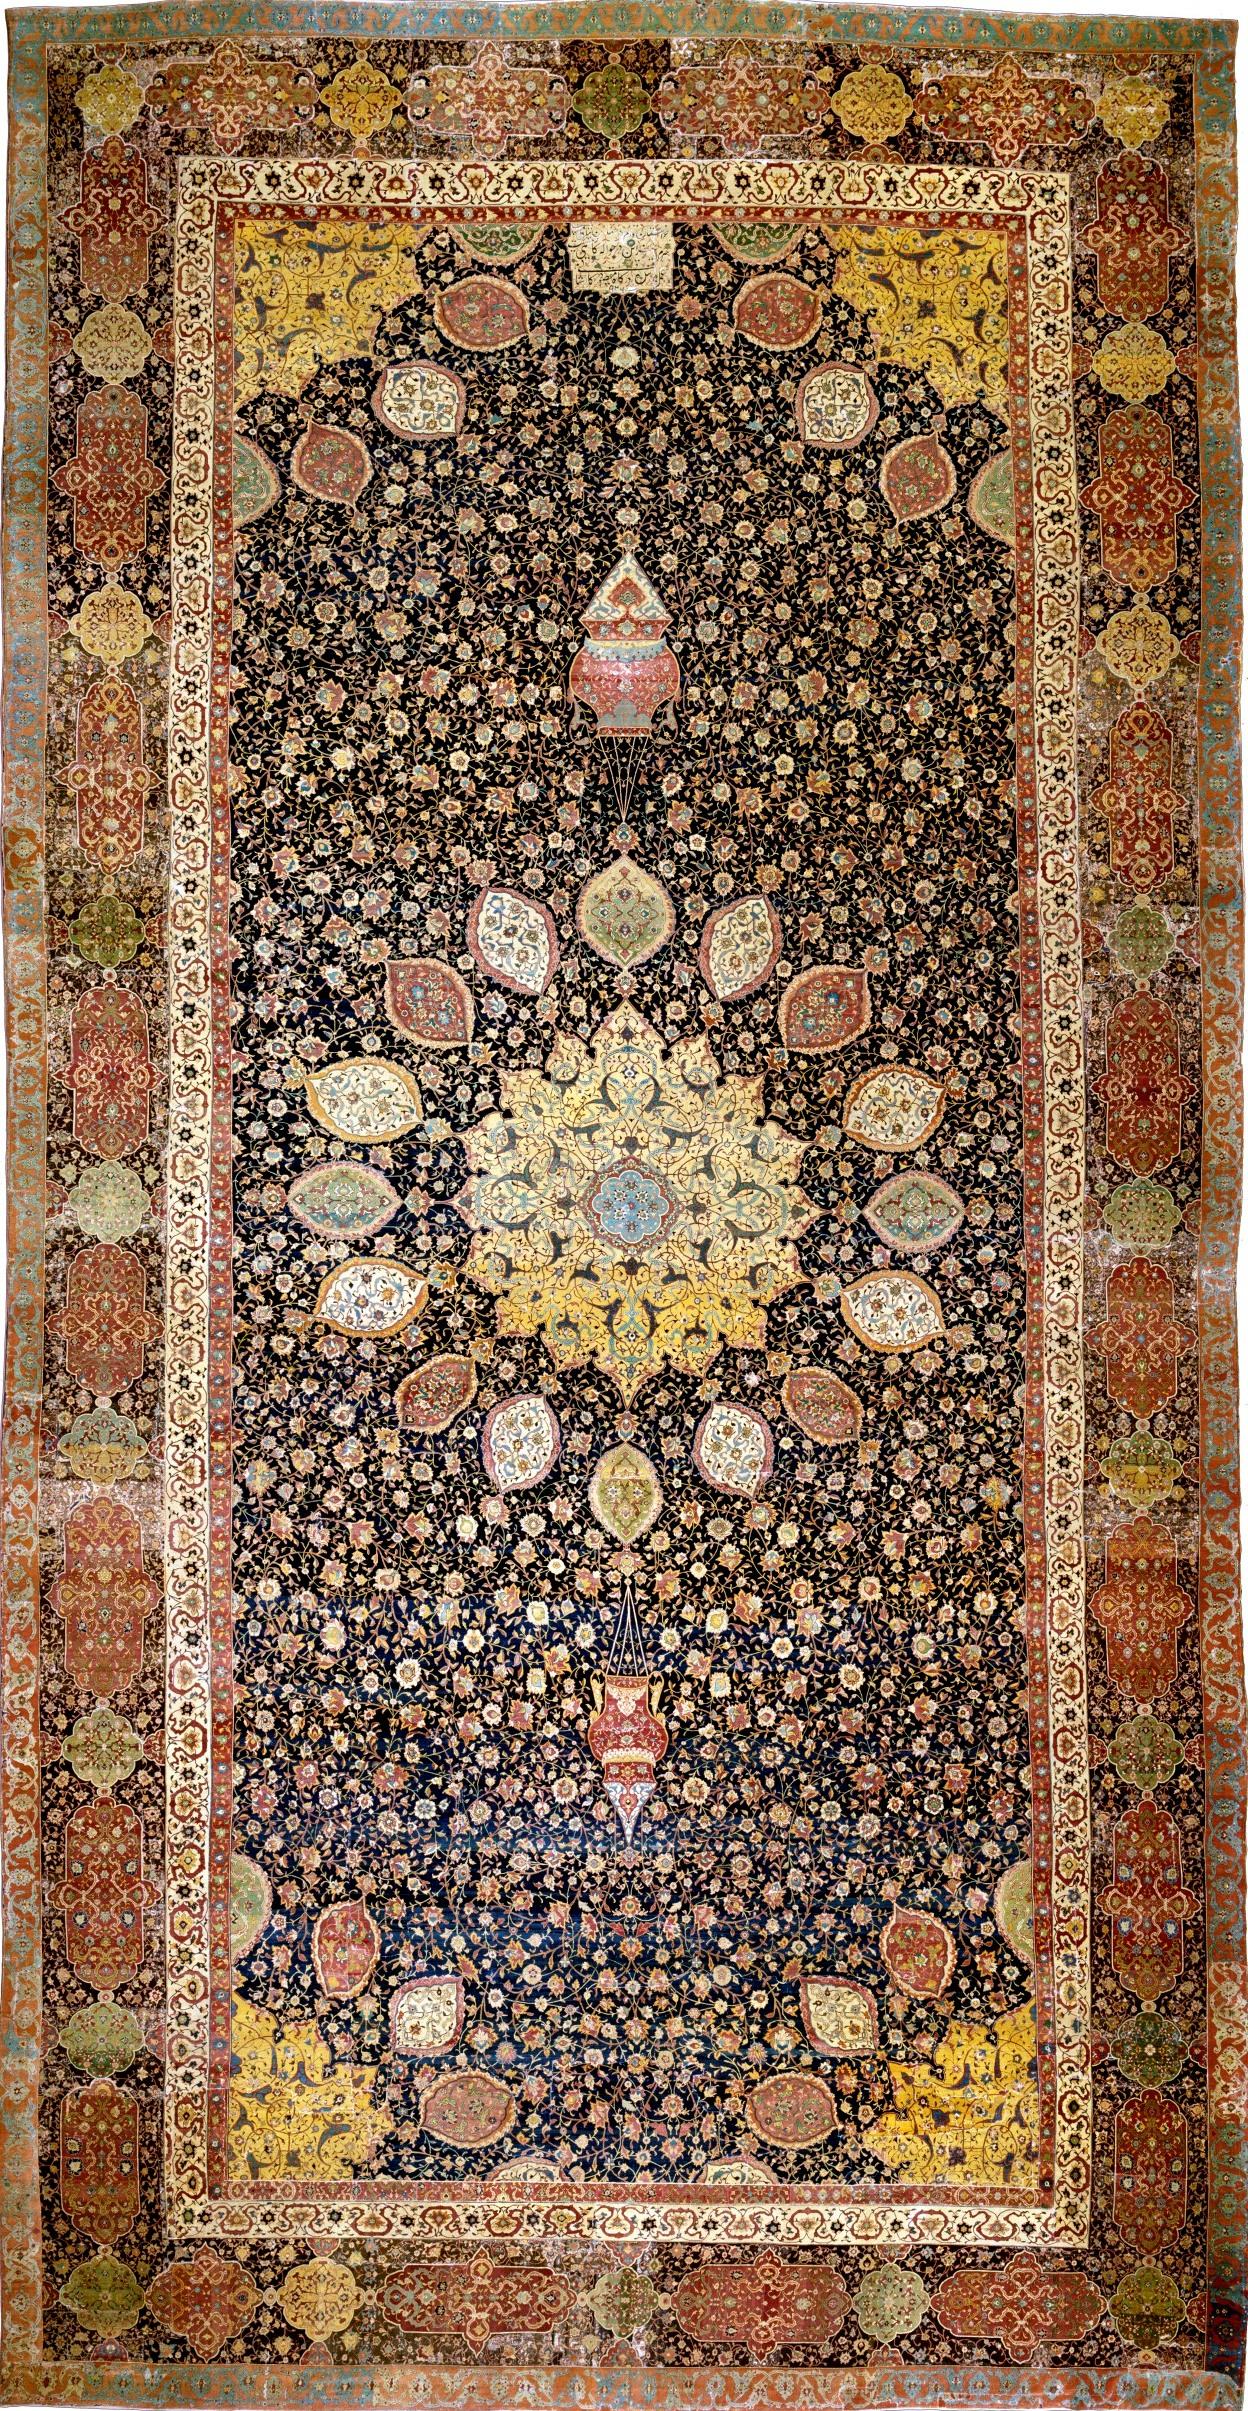 FileArdabil Carpetjpg Wikipedia